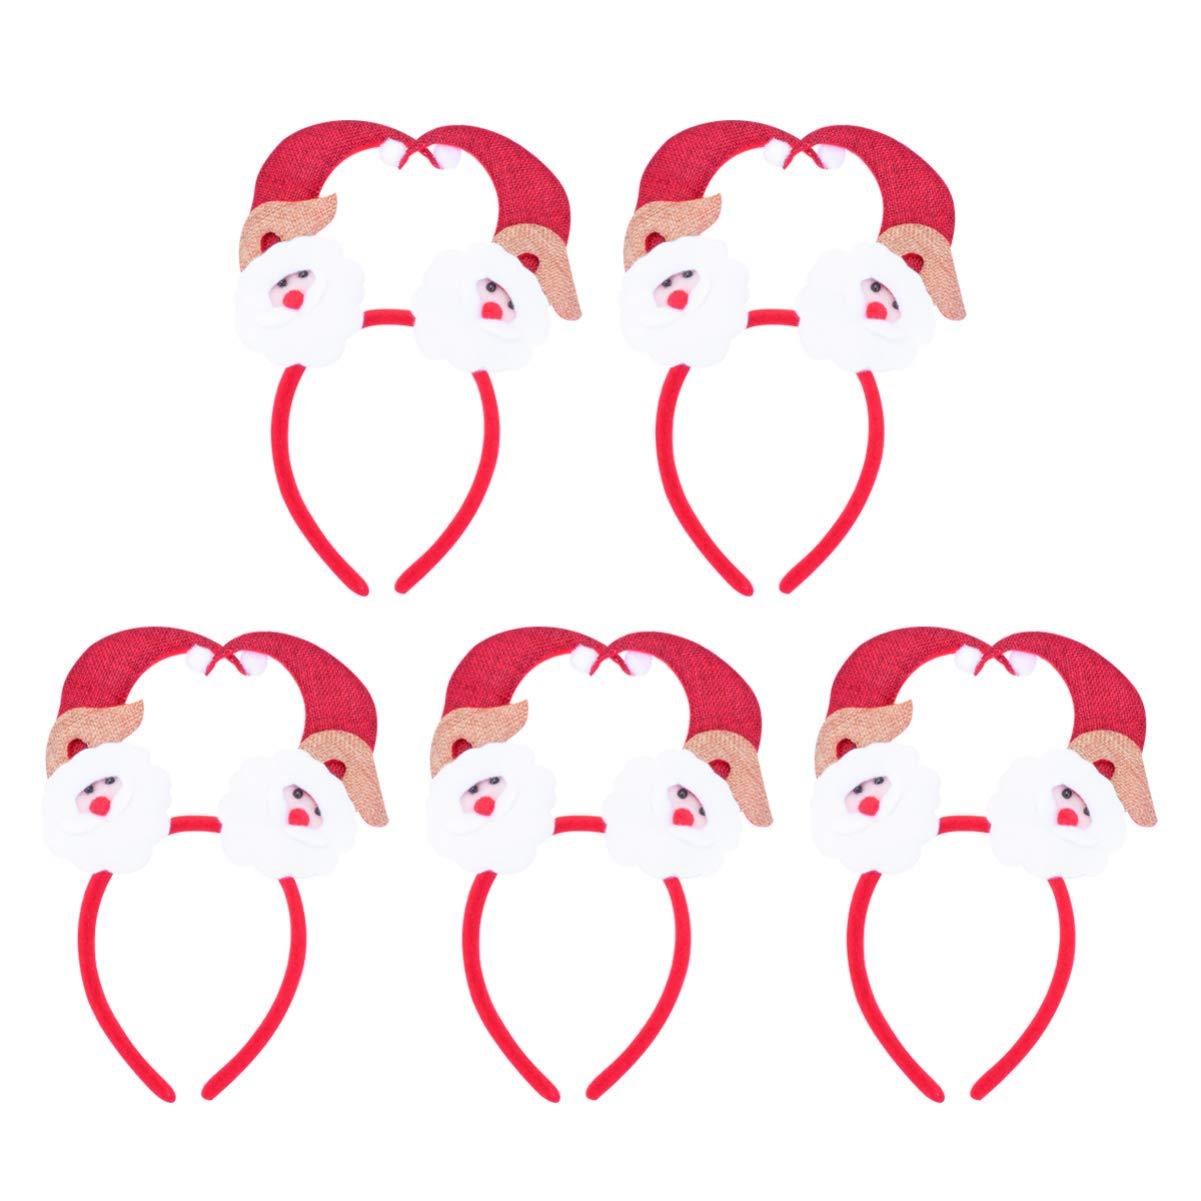 Amosfun 5PCS Christmas Hat Headband Decorative Plush Hair Hoops Holiday Cosplay Costume Party Hair Accessory (Santa)